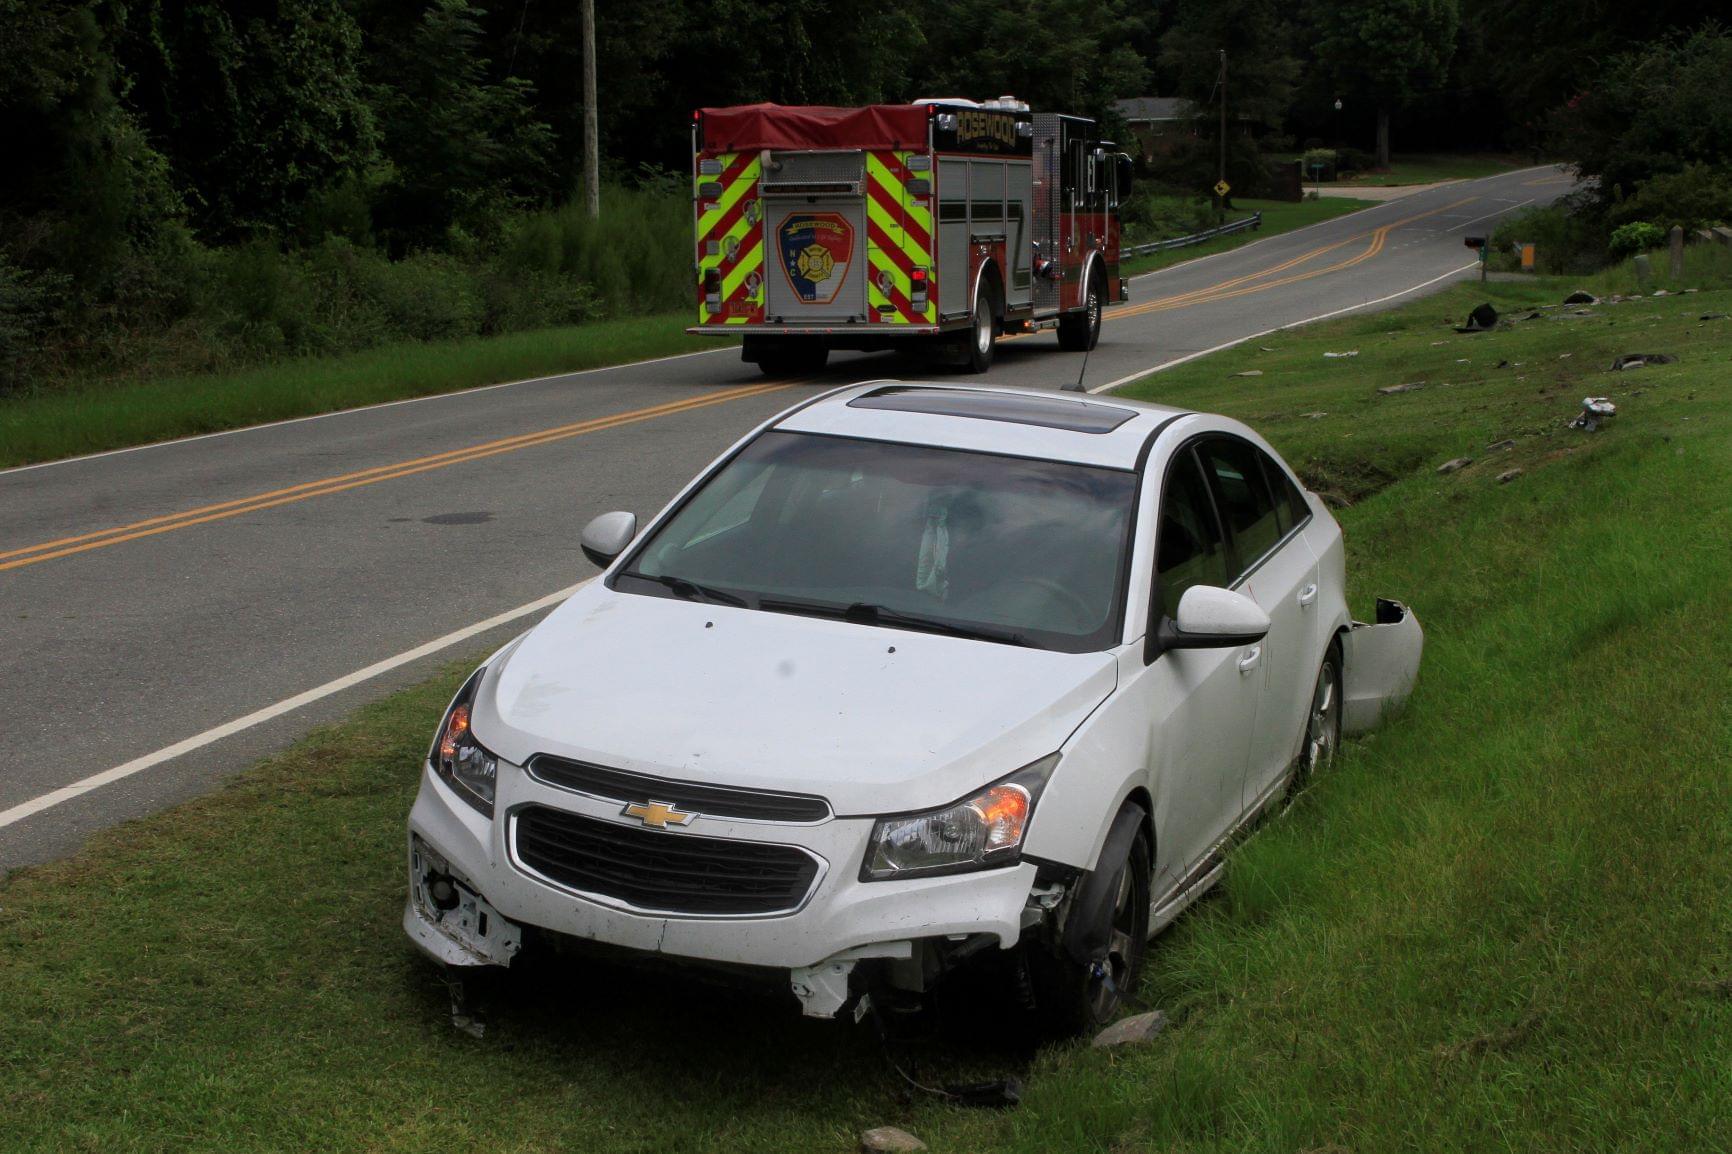 Vehicle Runs Off Road Near Rosewood (PHOTOS)